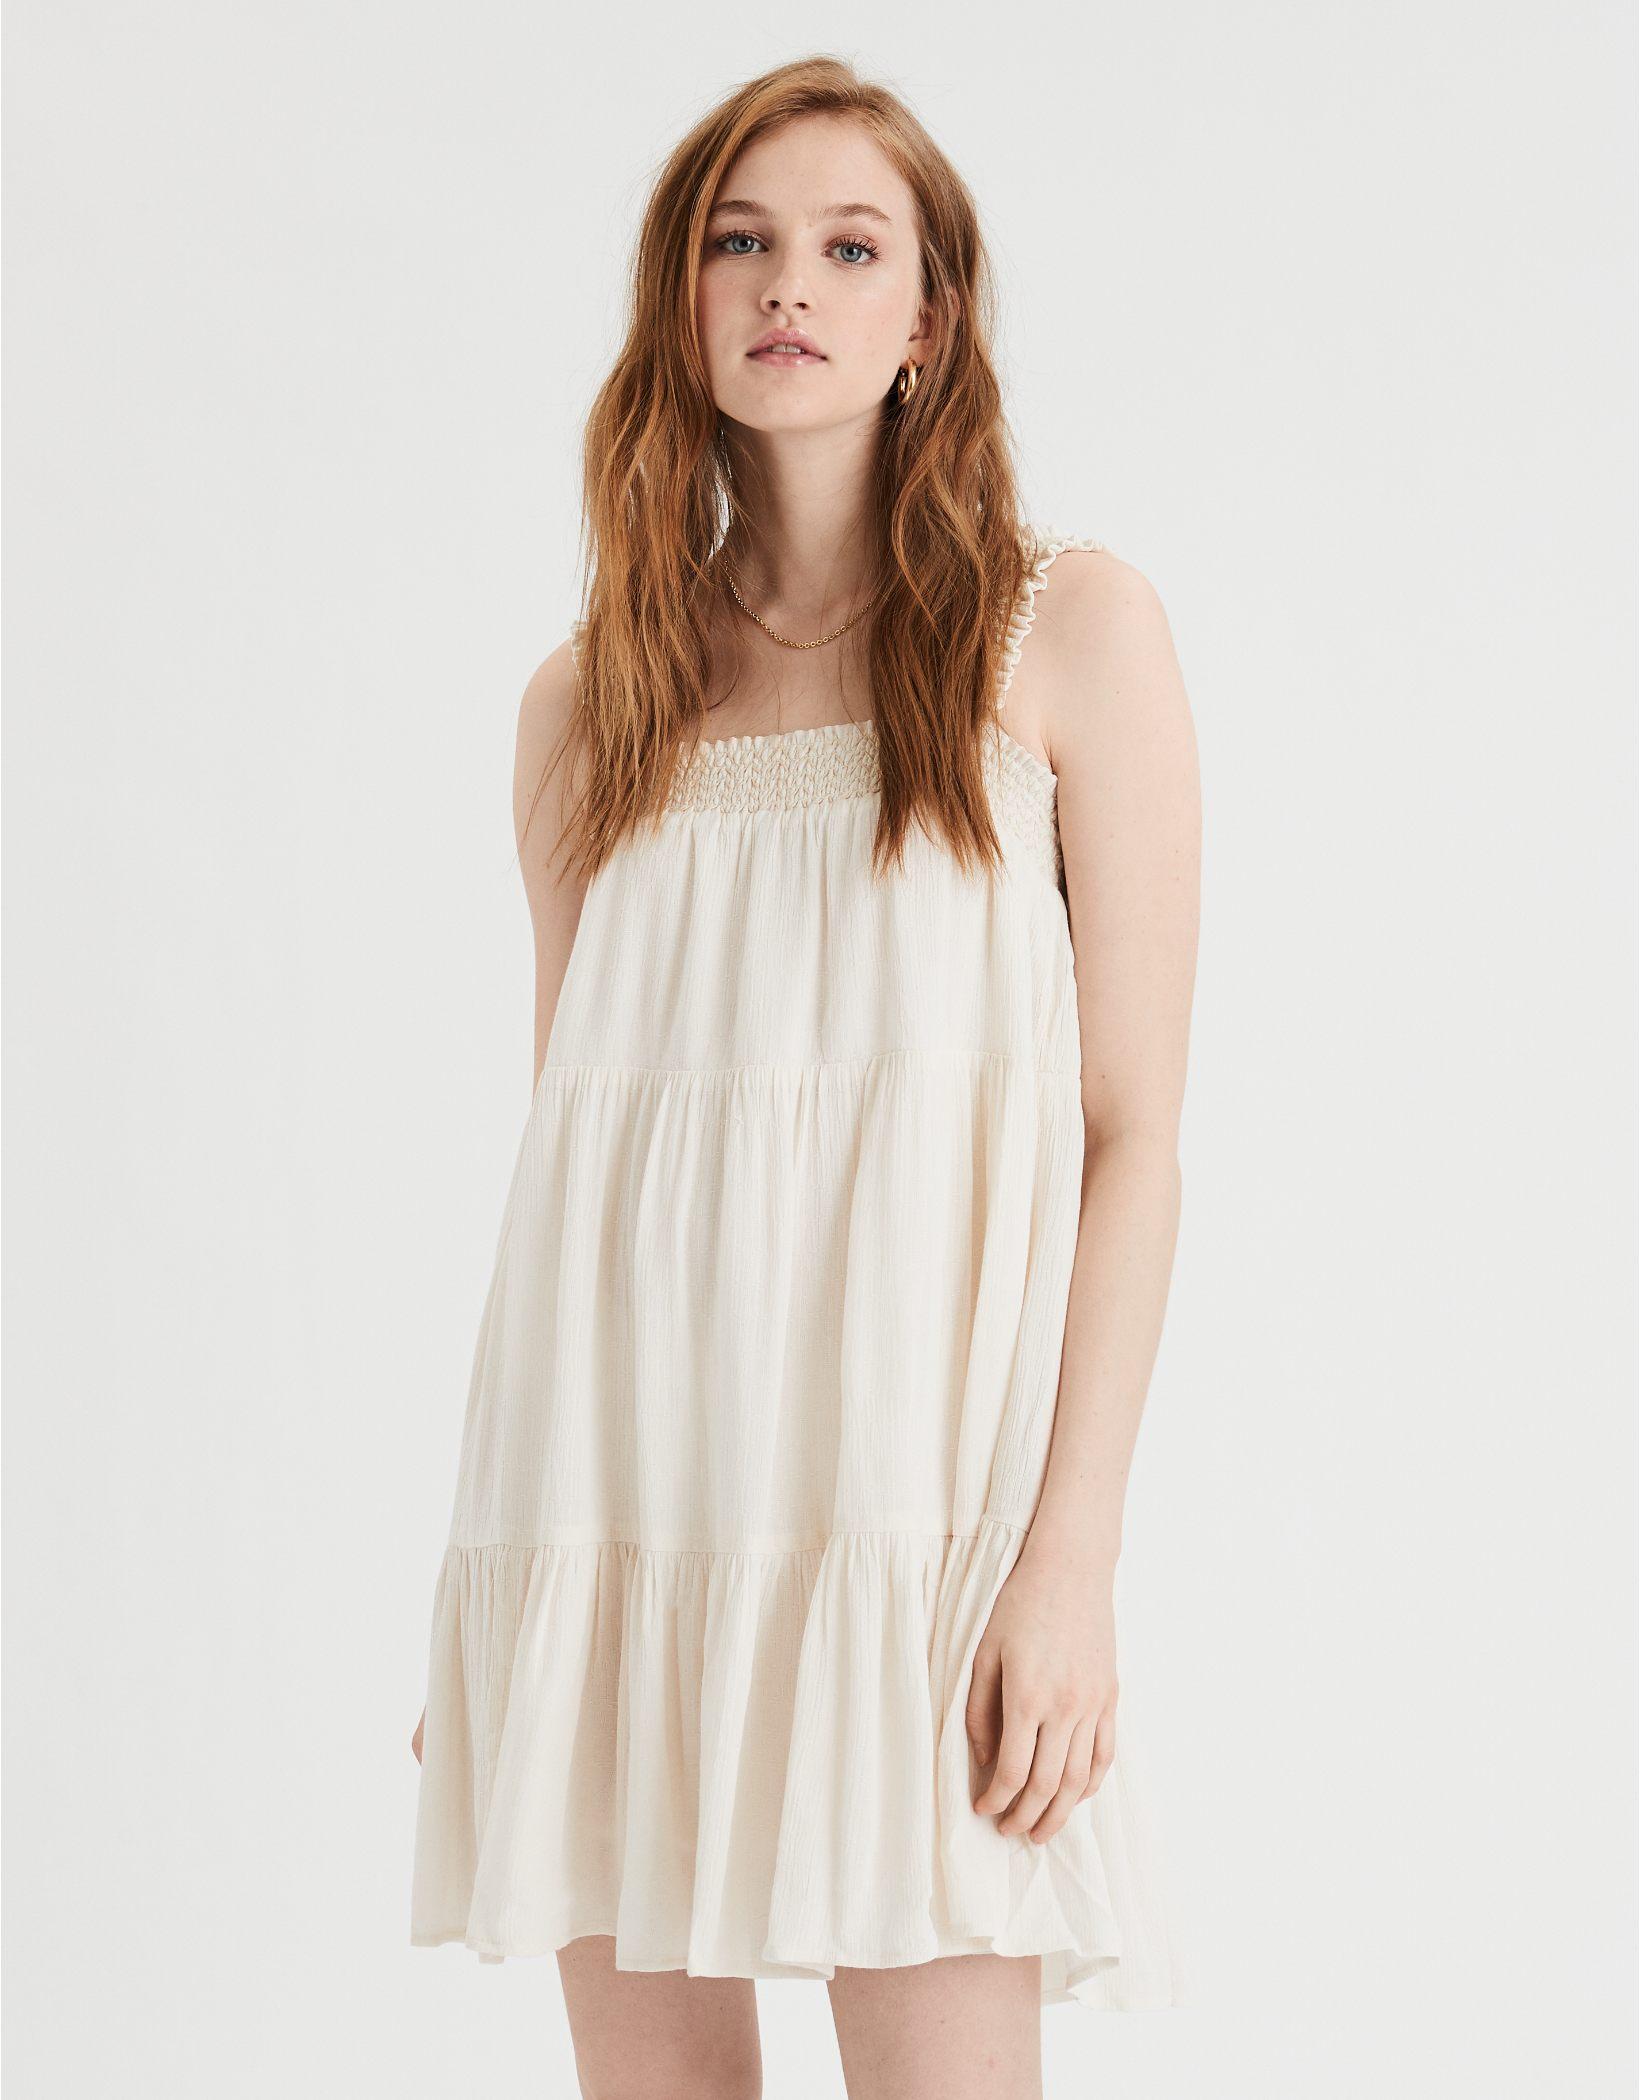 AE Smocked Babydoll Dress